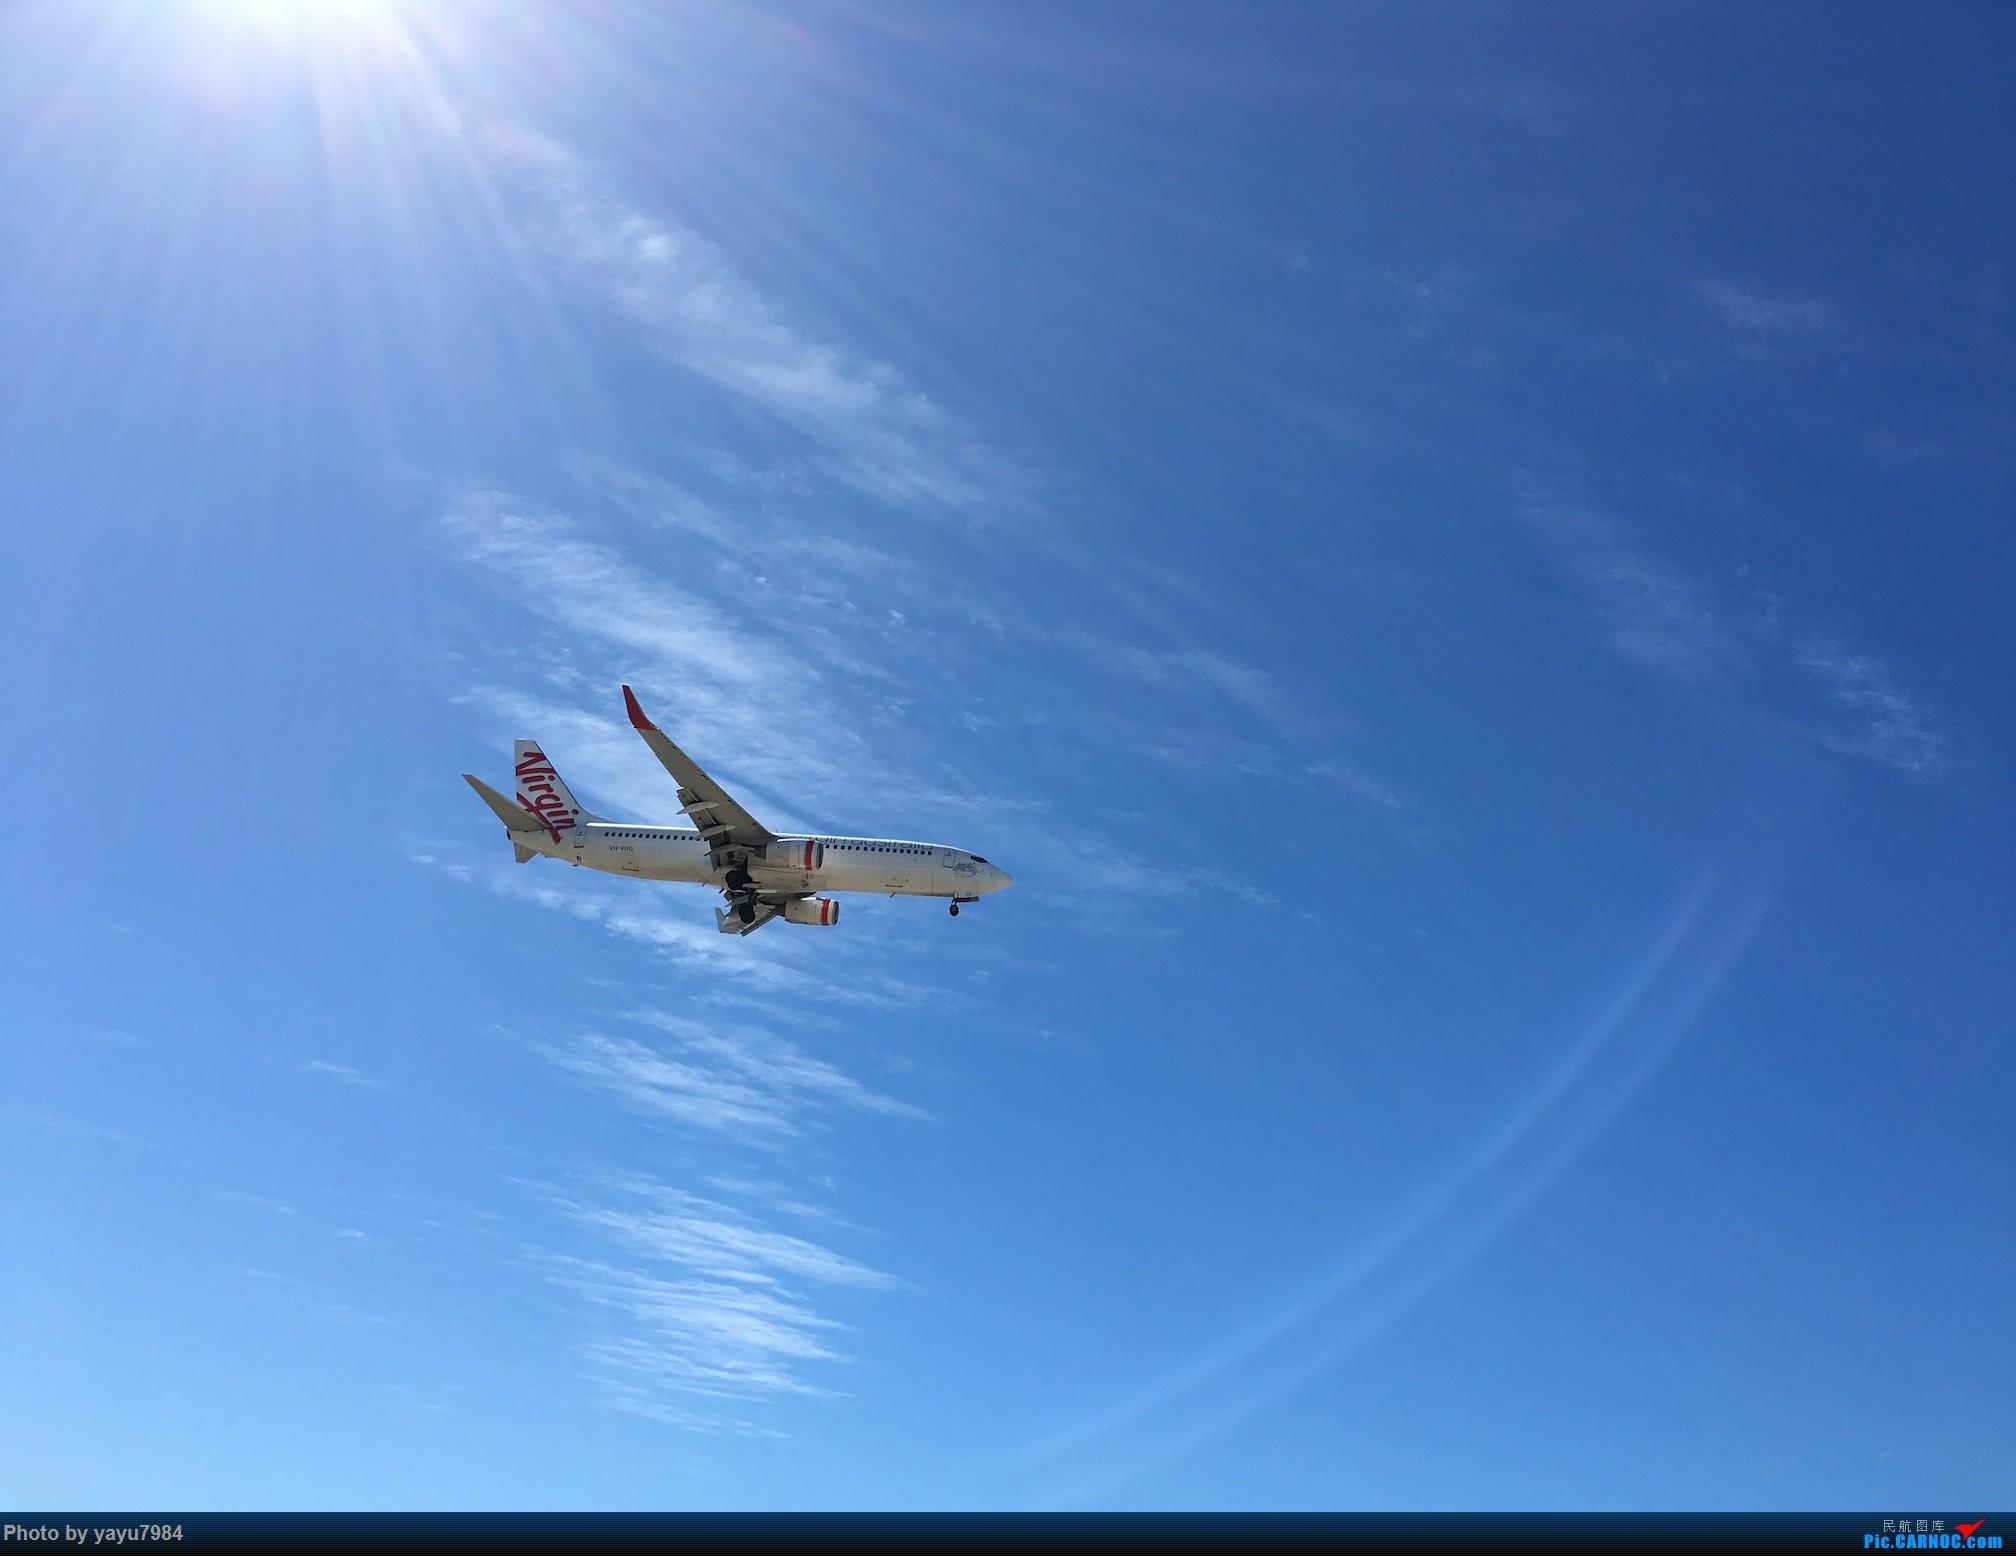 Re:[原创][SYD] 久违的南向起降,纪录16R拍机之行 BOEING 737-800 VH-VUG 澳大利亚悉尼金斯福德·史密斯机场